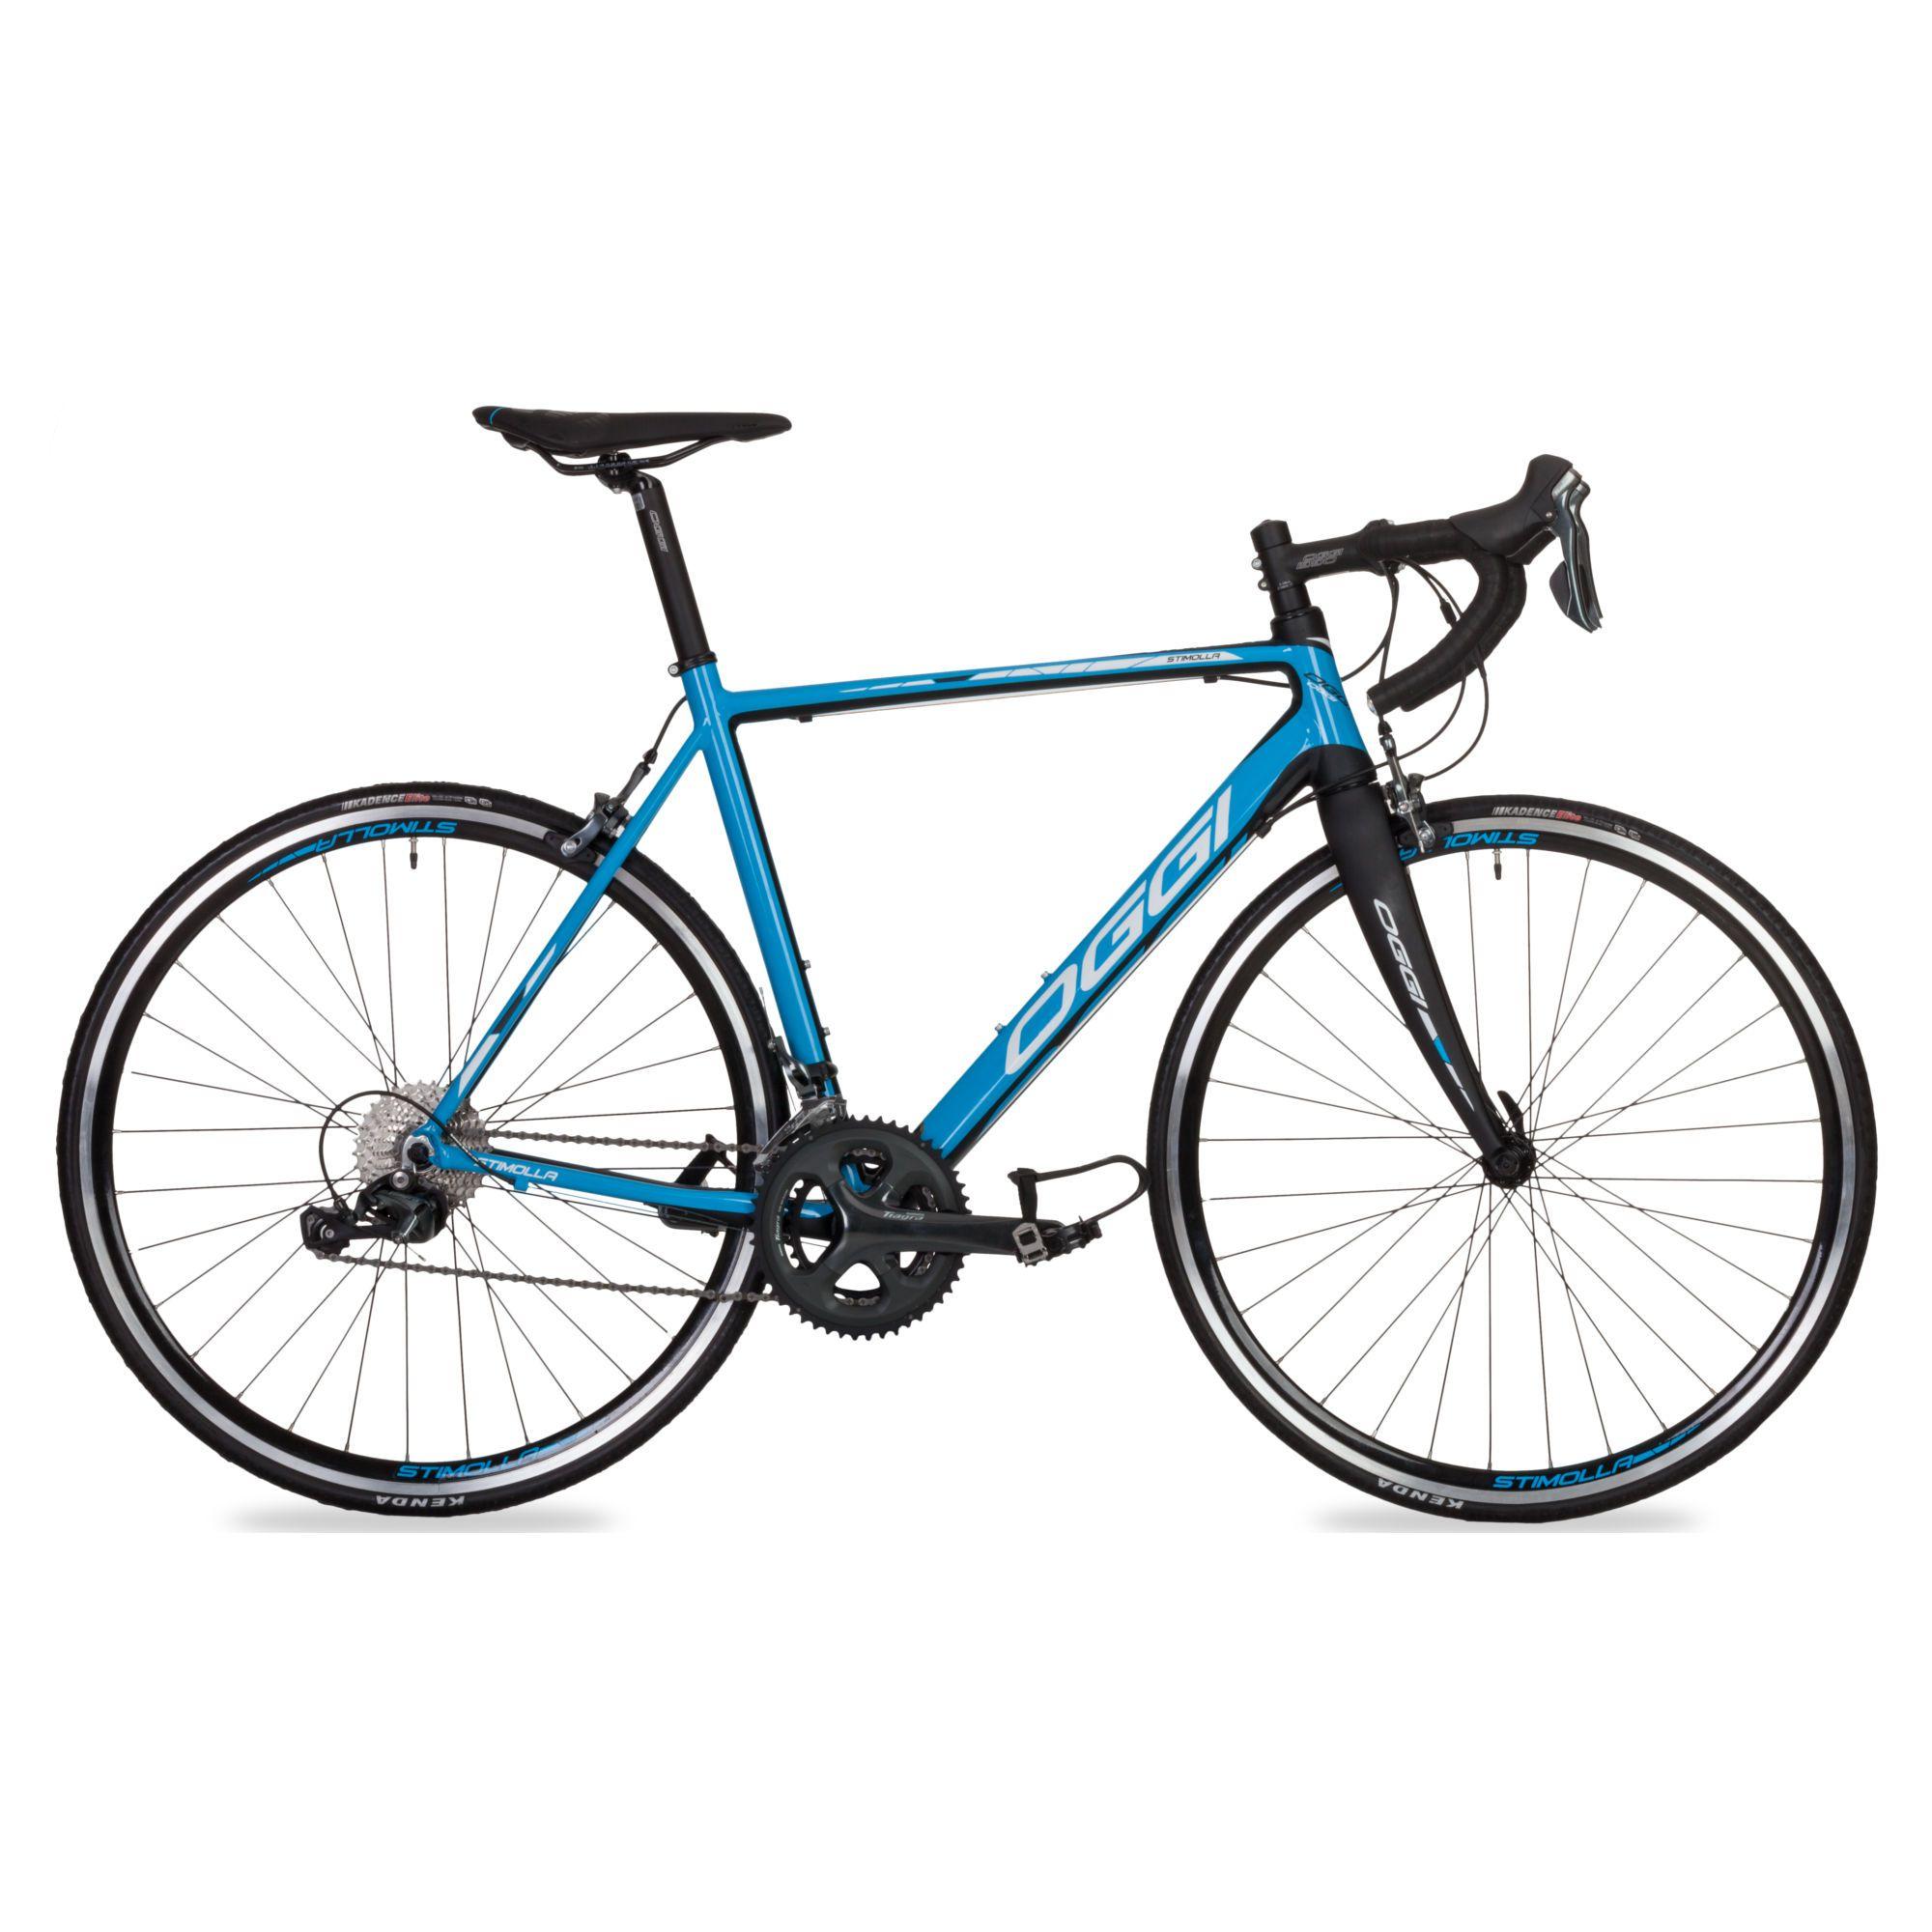 Bicicleta Speed Oggi Stimolla 20v 2018